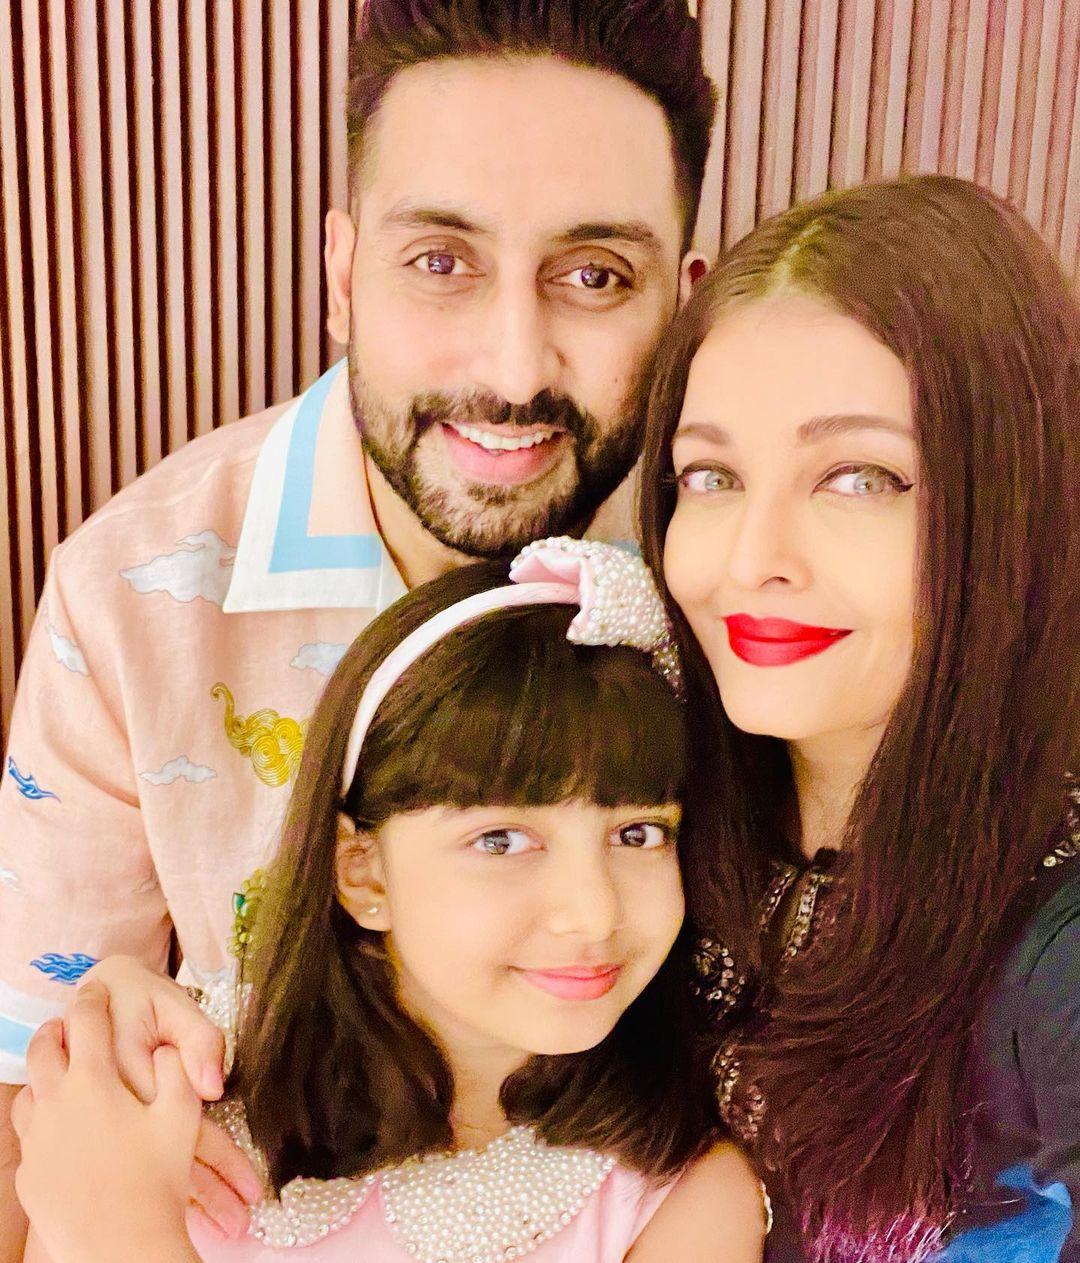 Actors Gossips: Aishwarya Rai Bachchan-Abhishek Bachchan pose for cute selfies with birthday girl Aaradhya Bachchan